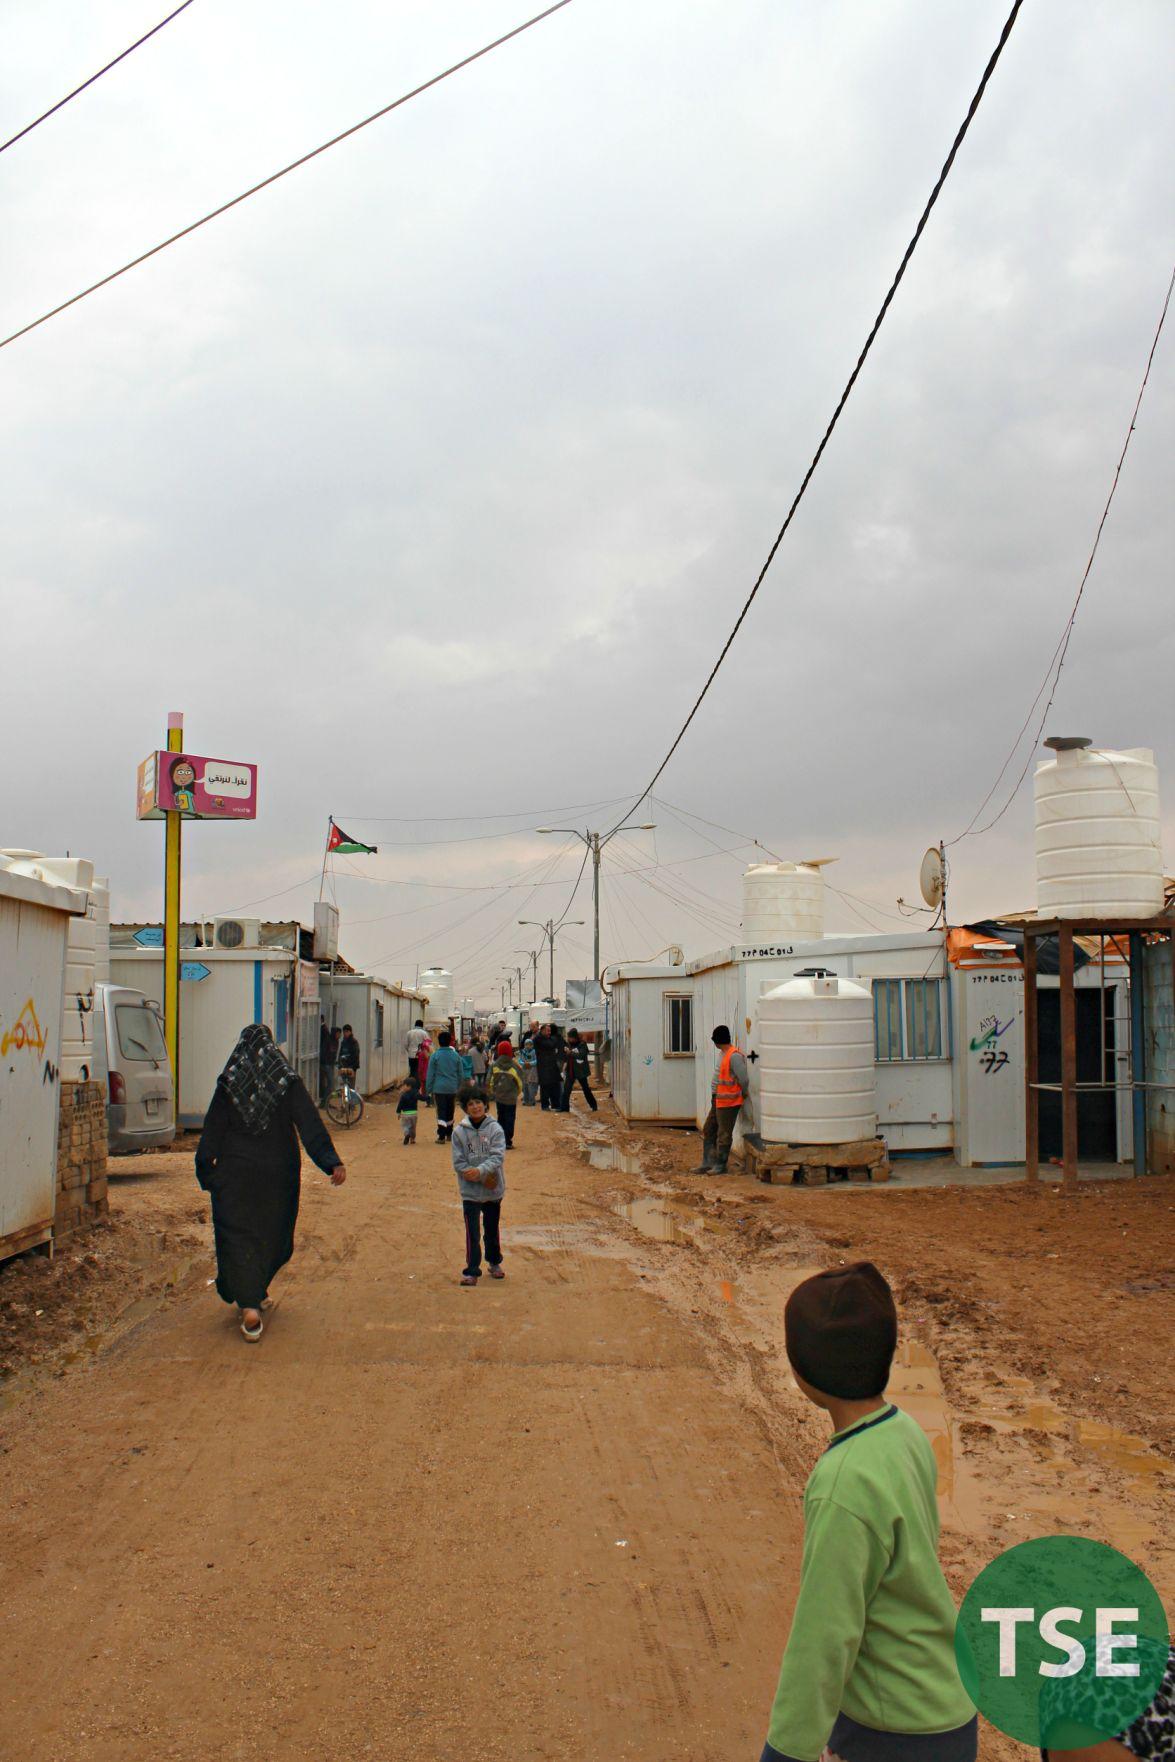 Zaatari refugee camp